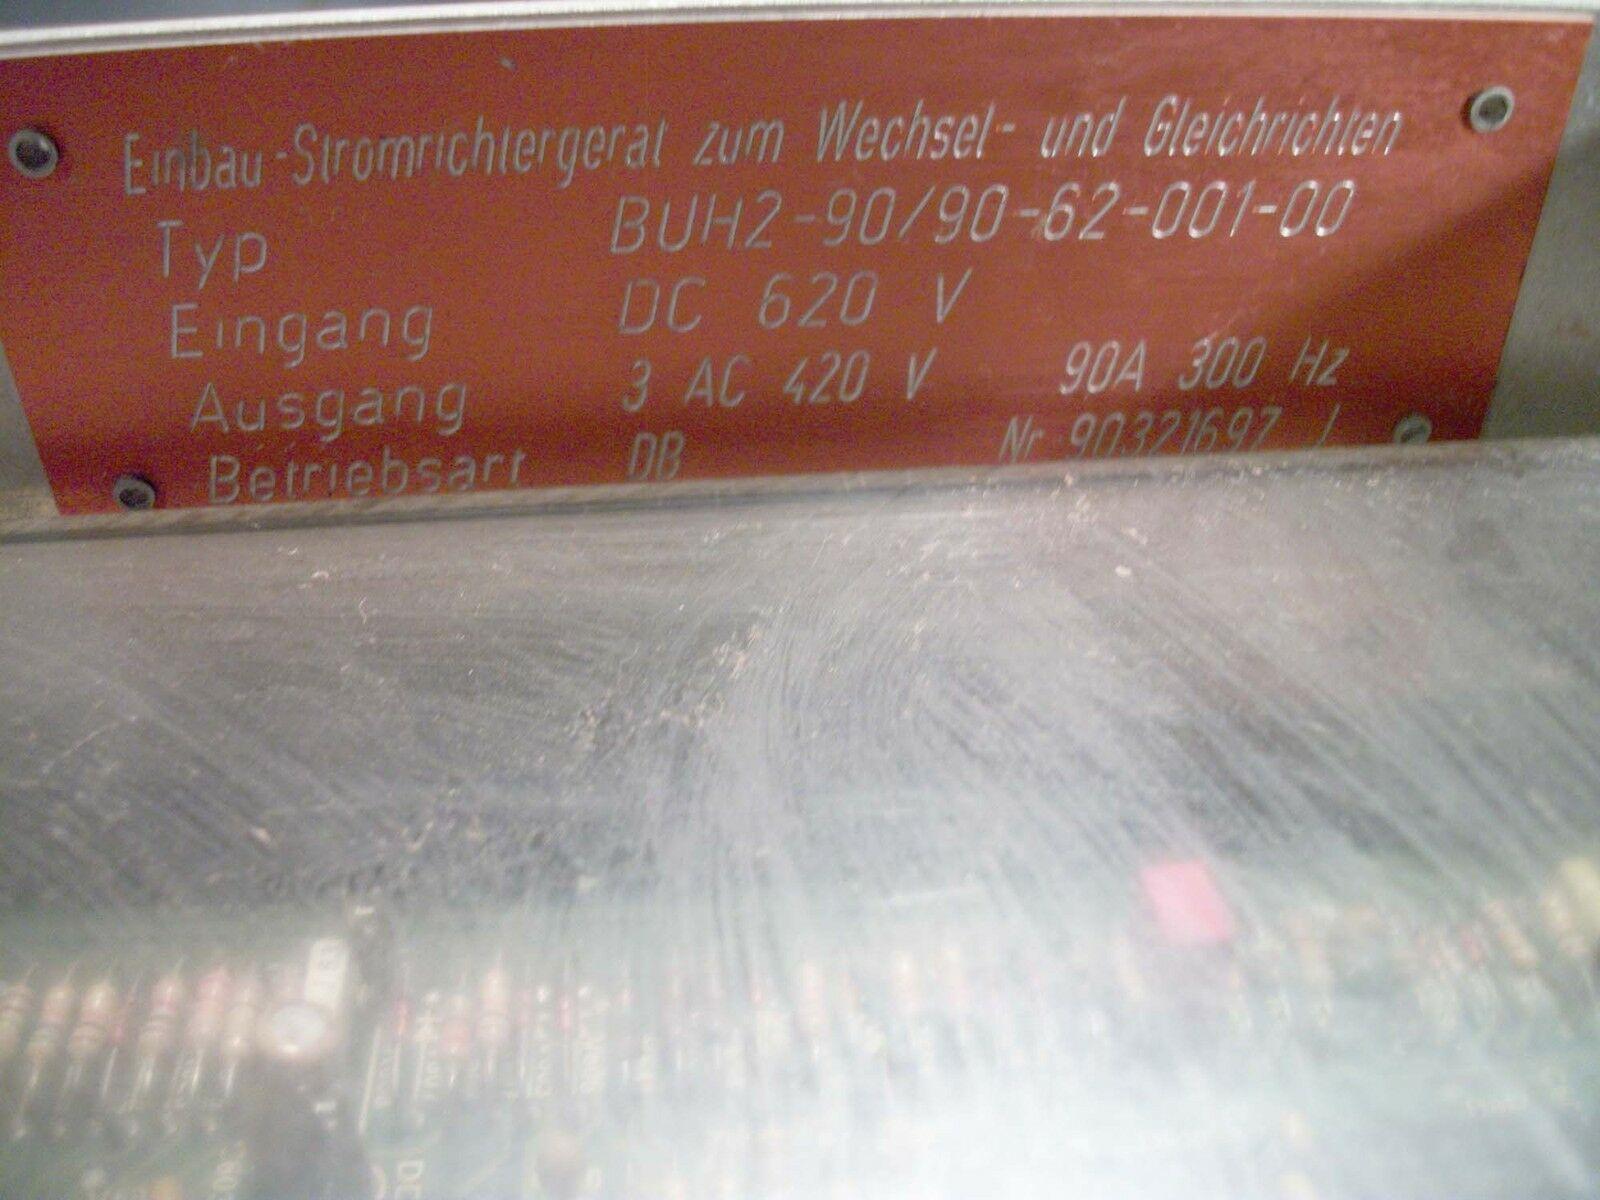 Baumuller Axis Drive 90A BUH2-90/90-62-001-00, Nr90321697 5